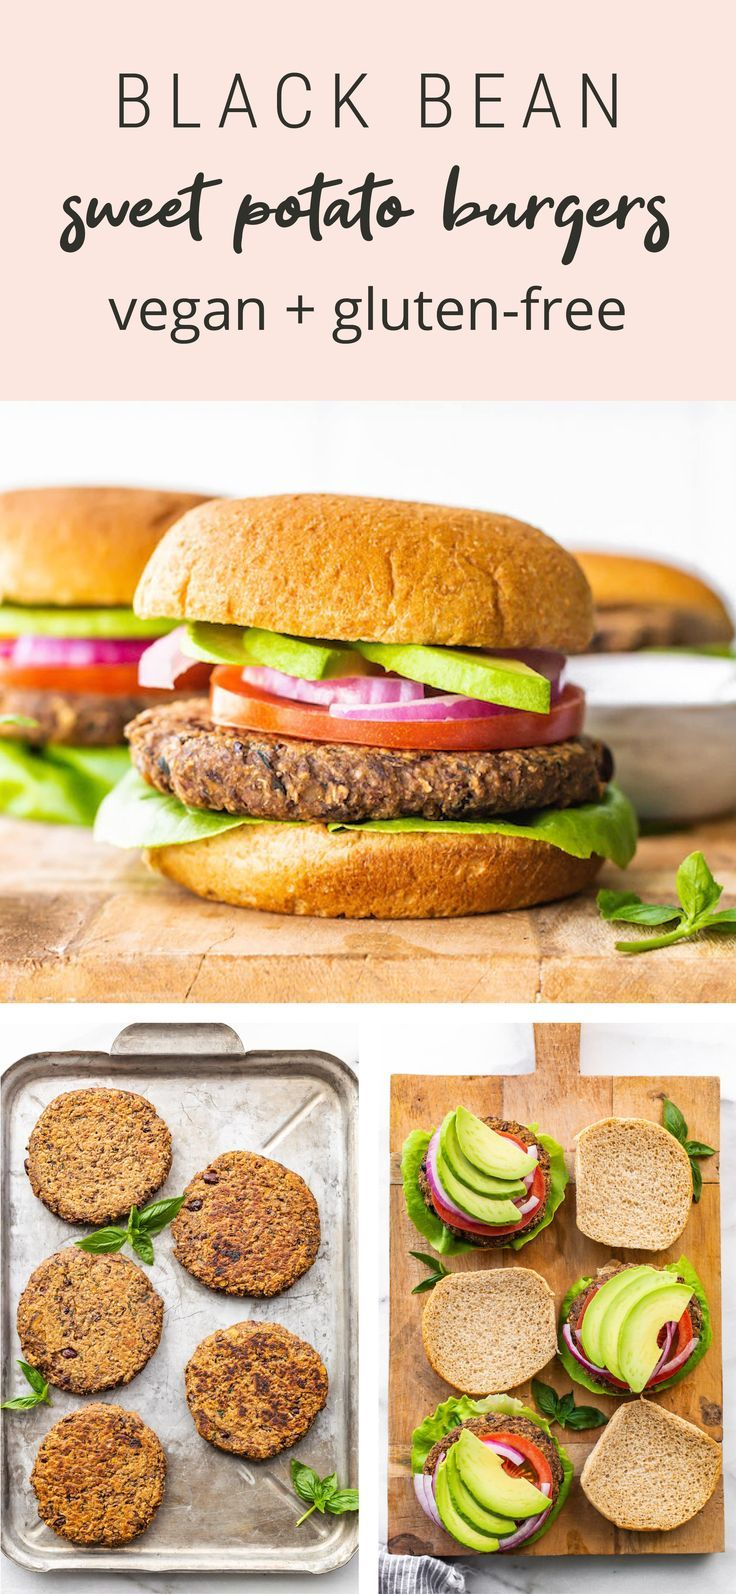 Black Bean Sweet Potato Burger Recipe Eating Bird Food Recipe In 2020 Sweet Potato Burgers Vegan Recipes Healthy Food Allergies